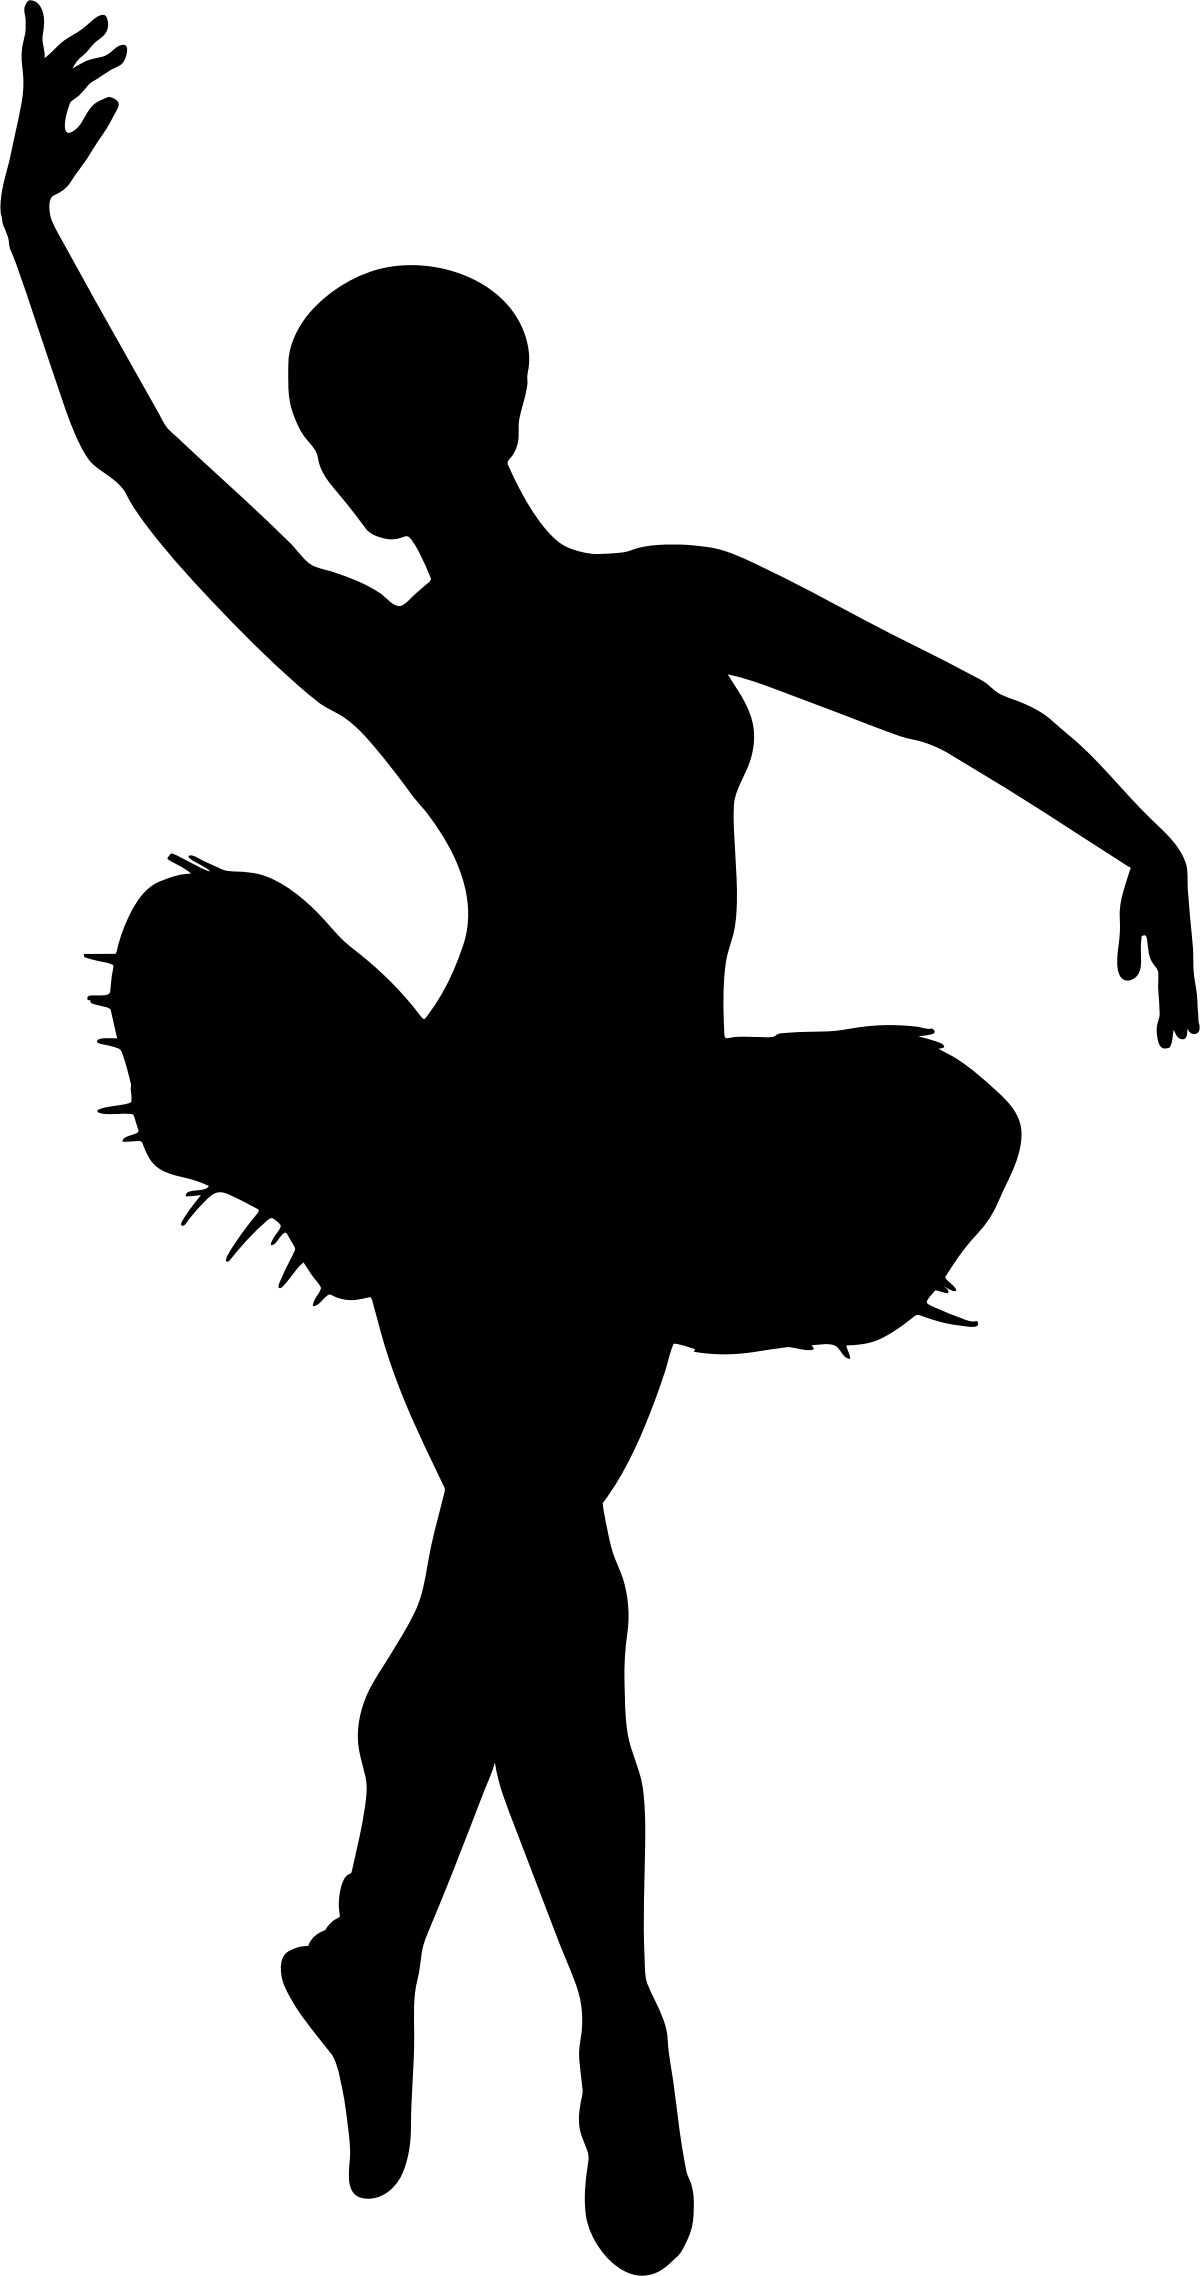 Ballet clipart transparent Png Ballet Art silhouette Free